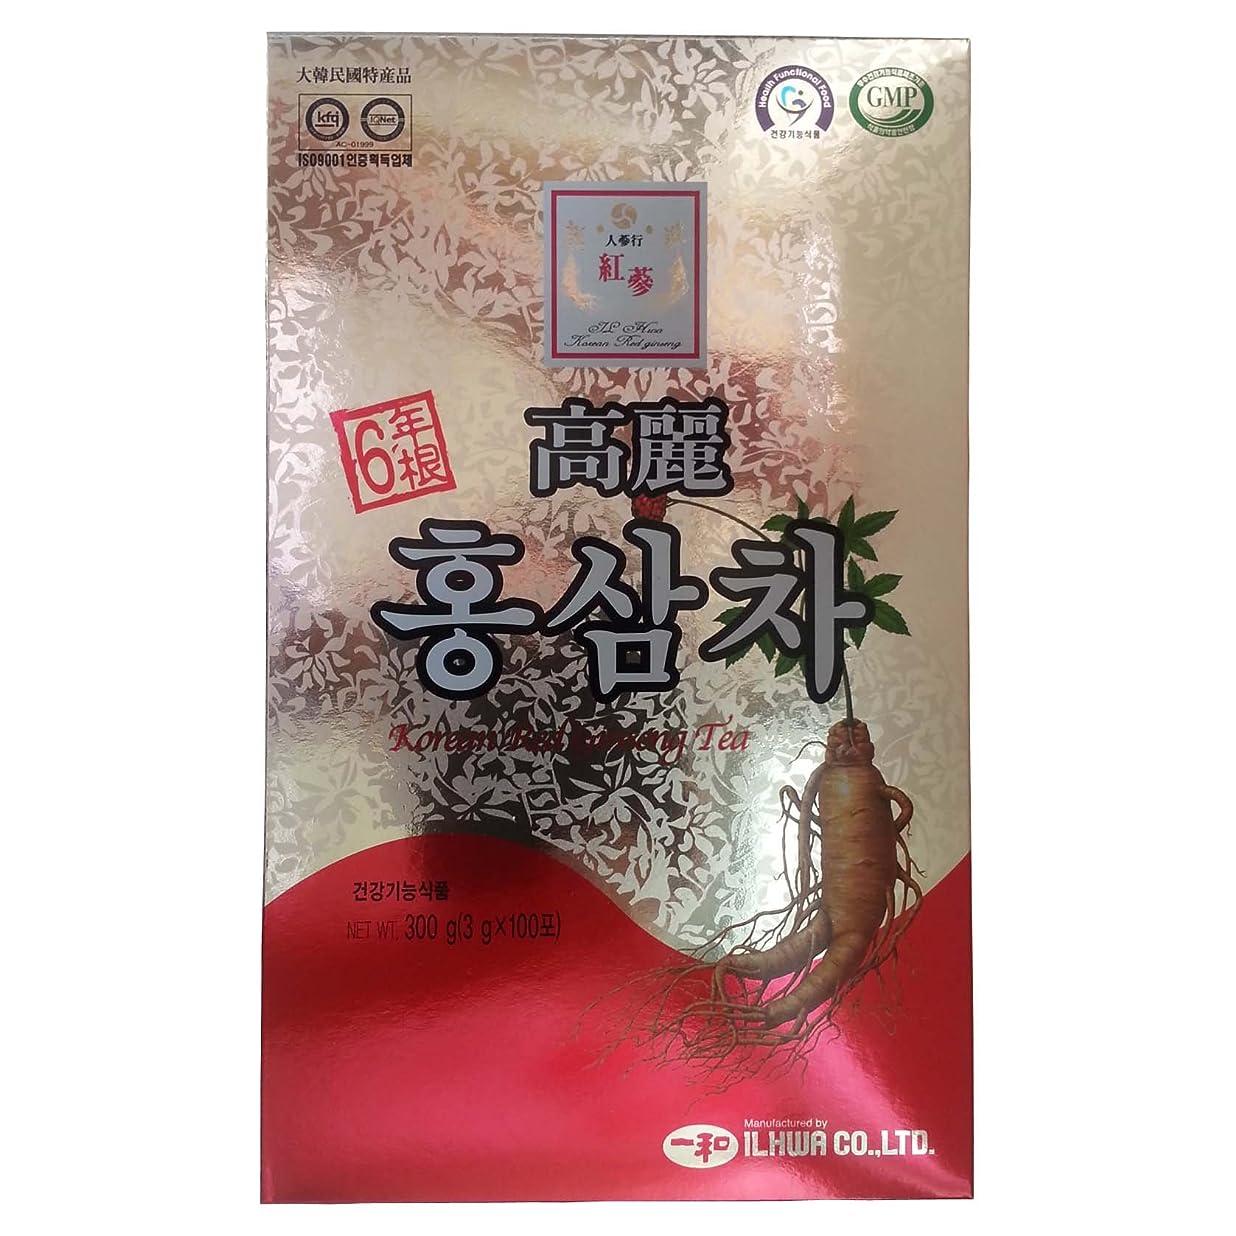 野菜今ペレット高麗人参 一和高麗紅参茶 6年根 3g×100包 【並行輸入品】